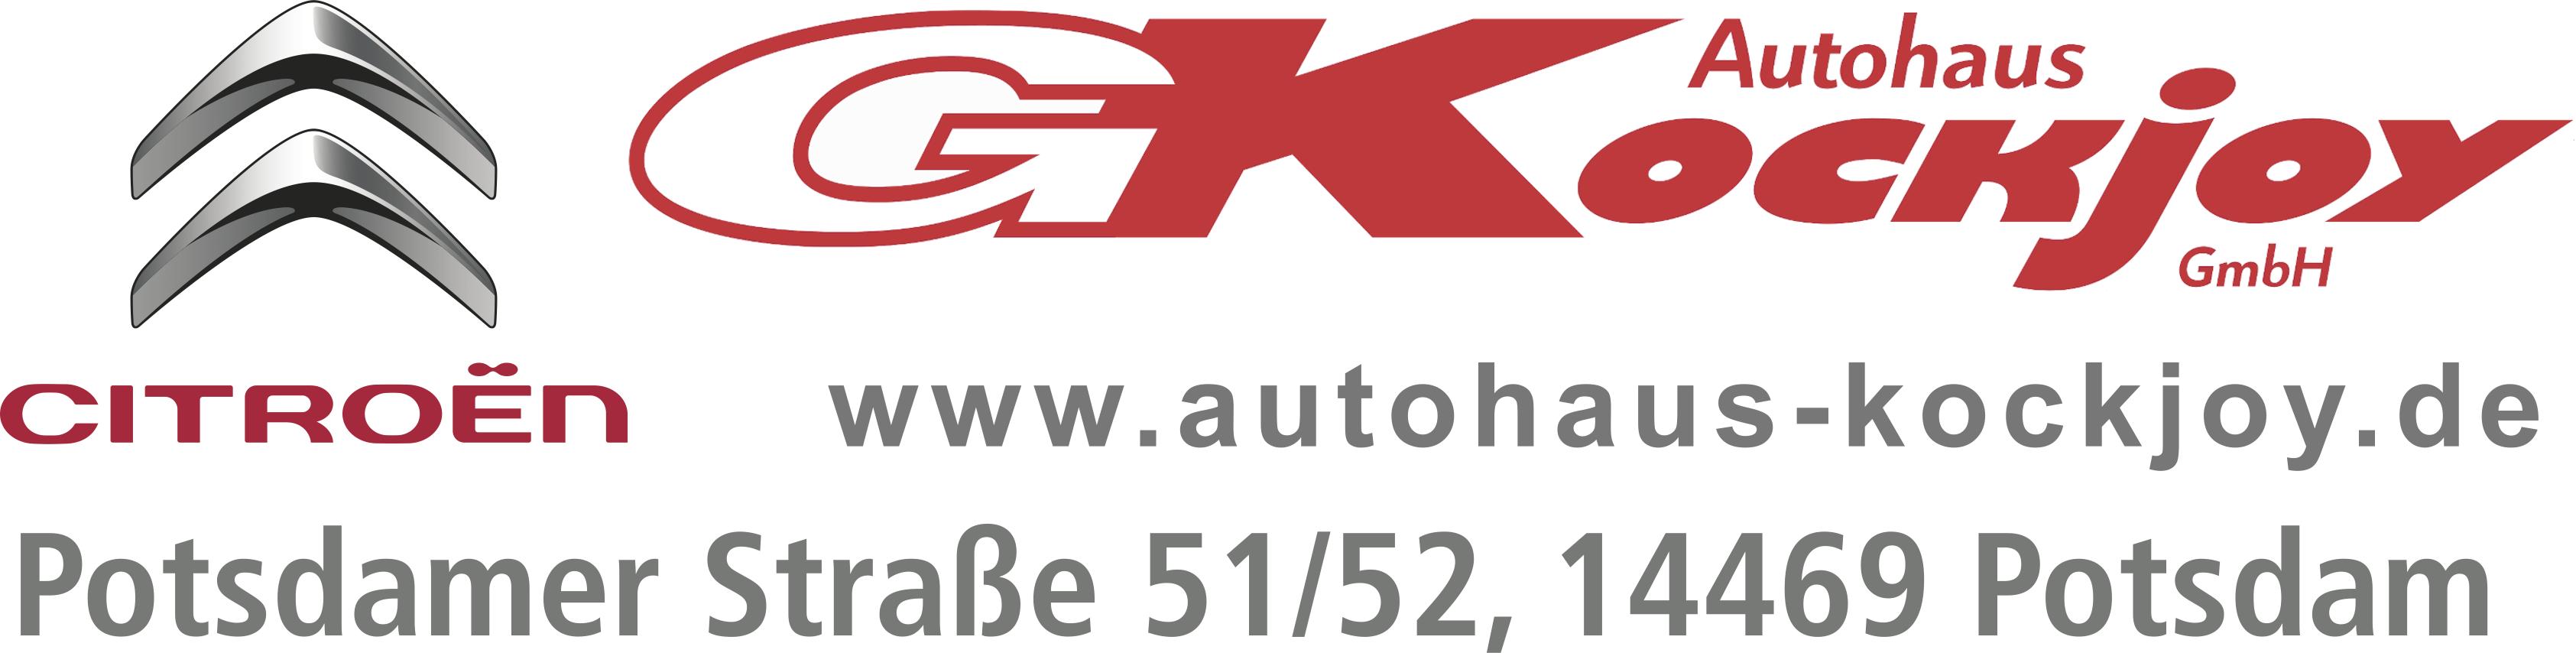 Autohaus Gerhard Kockjoy